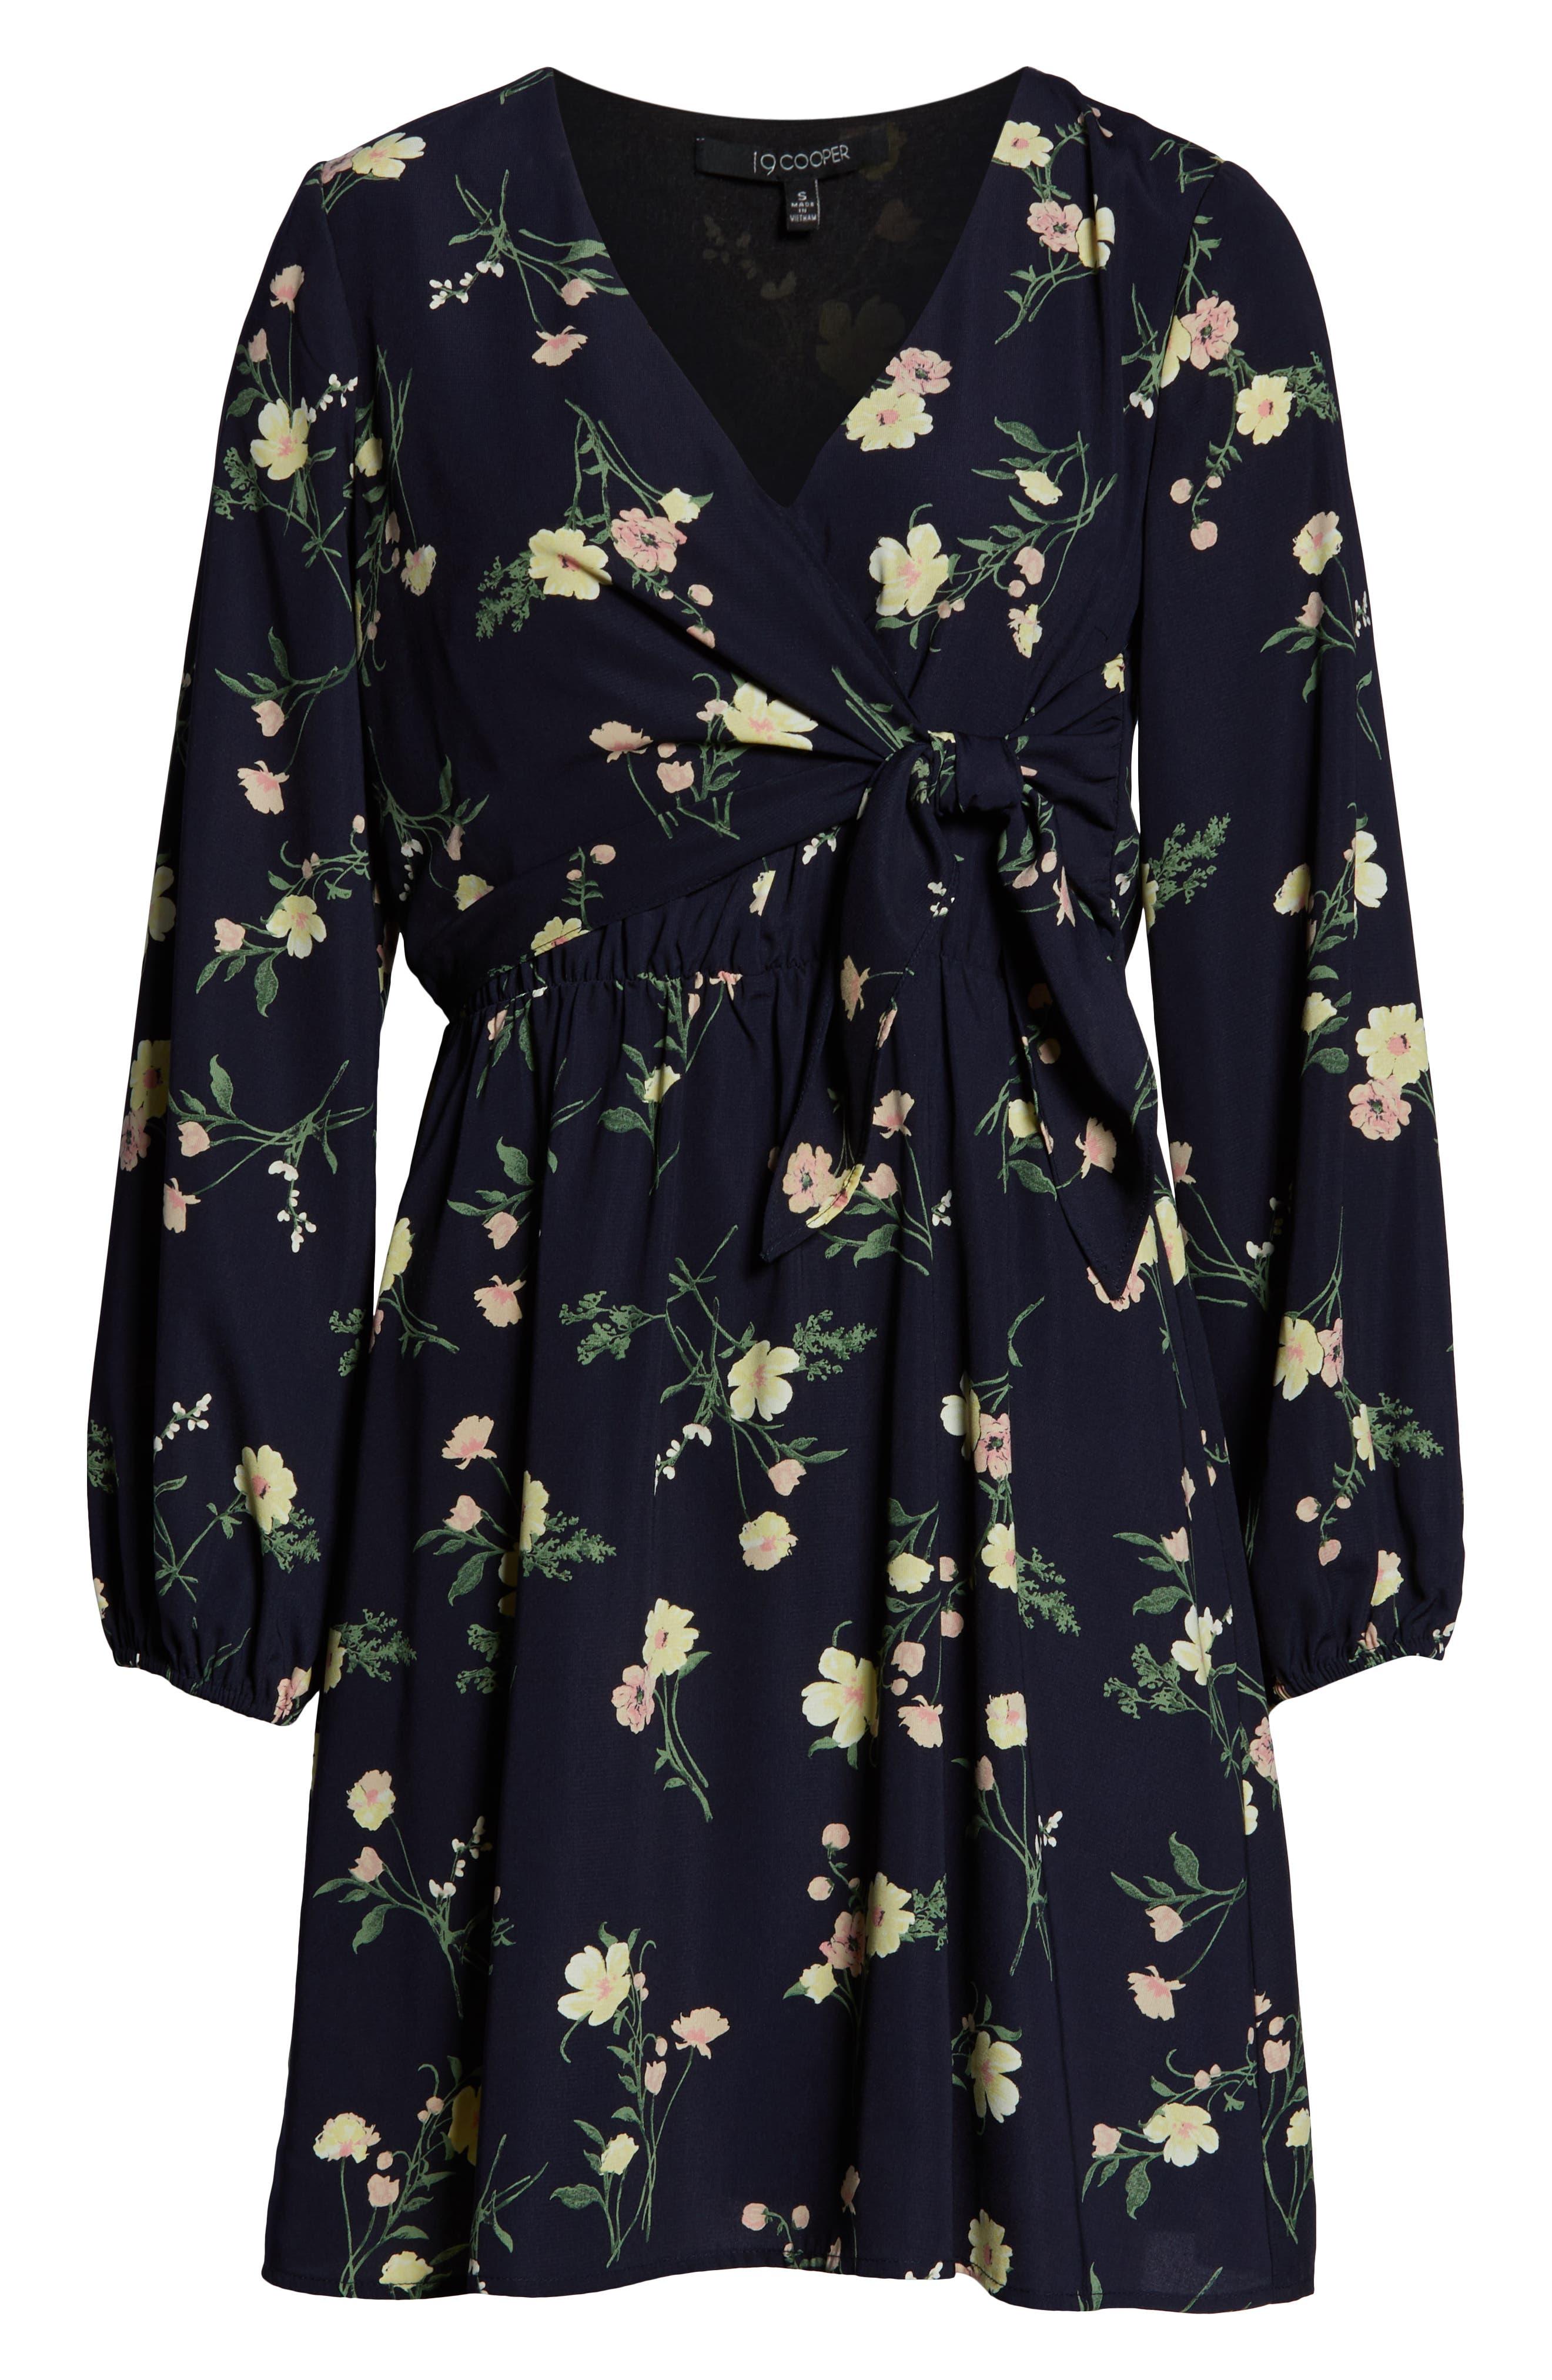 19 COOPER, Long Sleeve Floral Dress, Alternate thumbnail 7, color, NAVY FLORAL